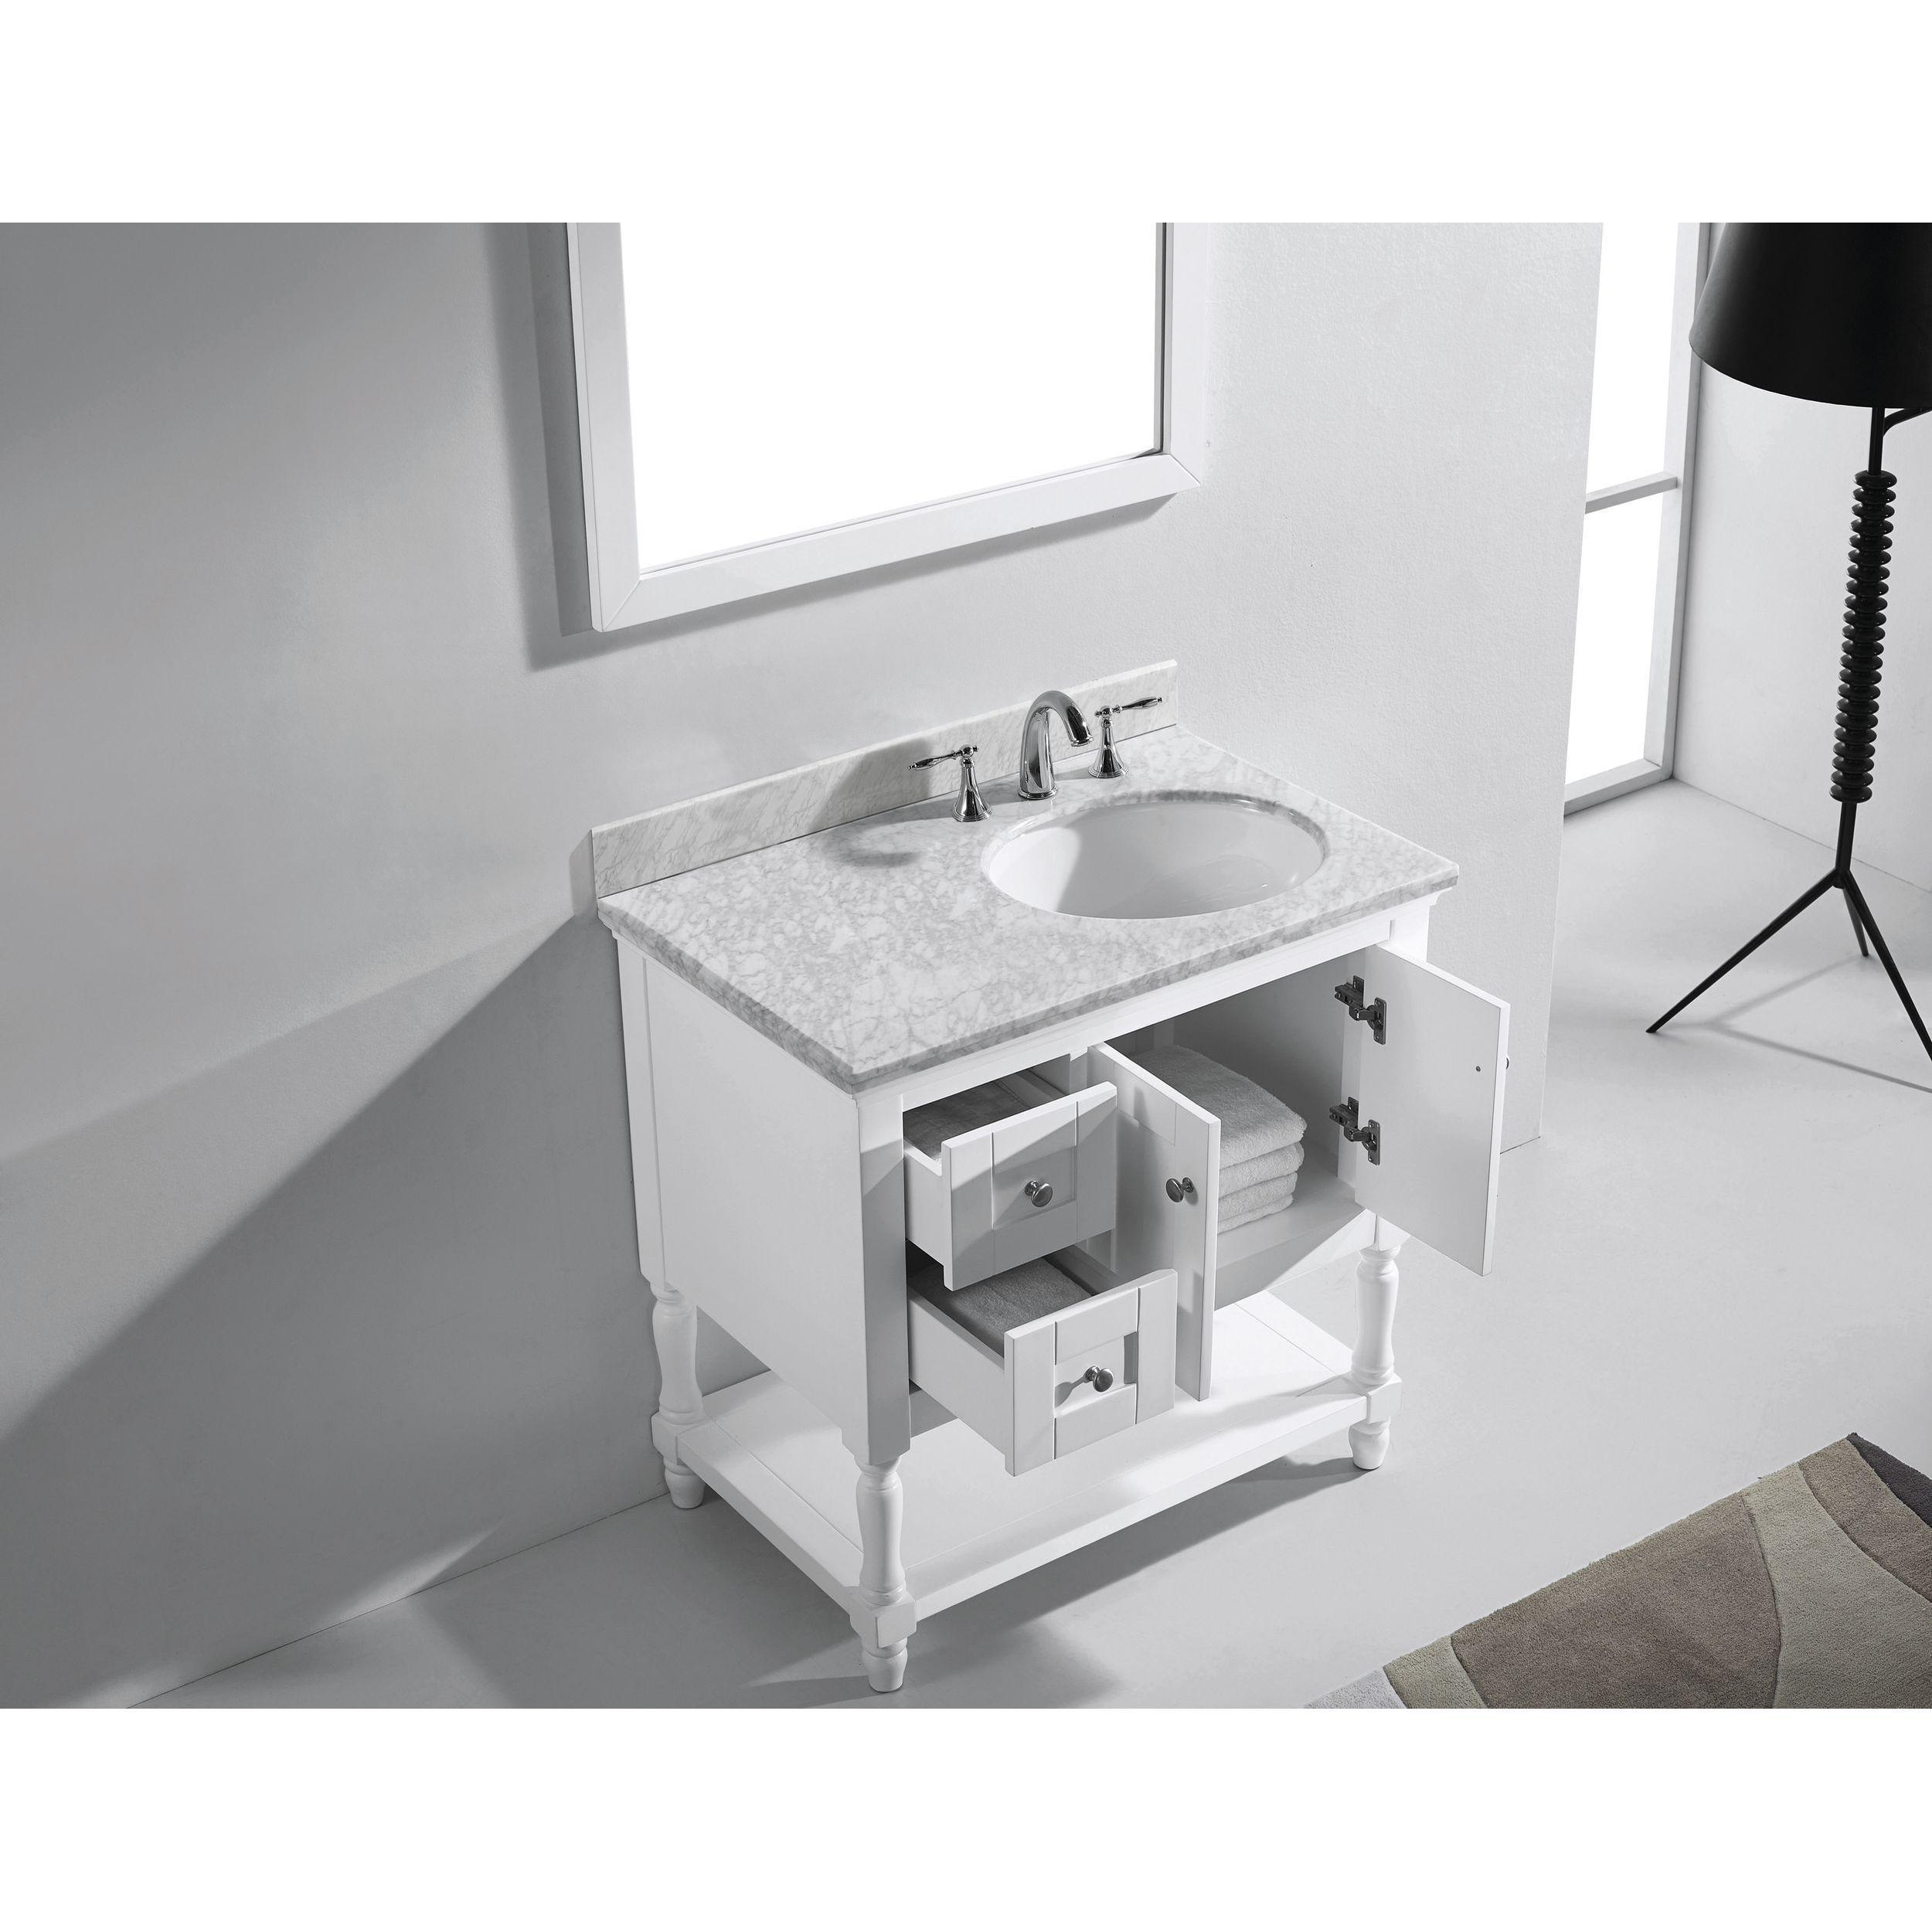 Julianna 36-inch Italian Carrara White Marble Single Bathroom Vanity ...